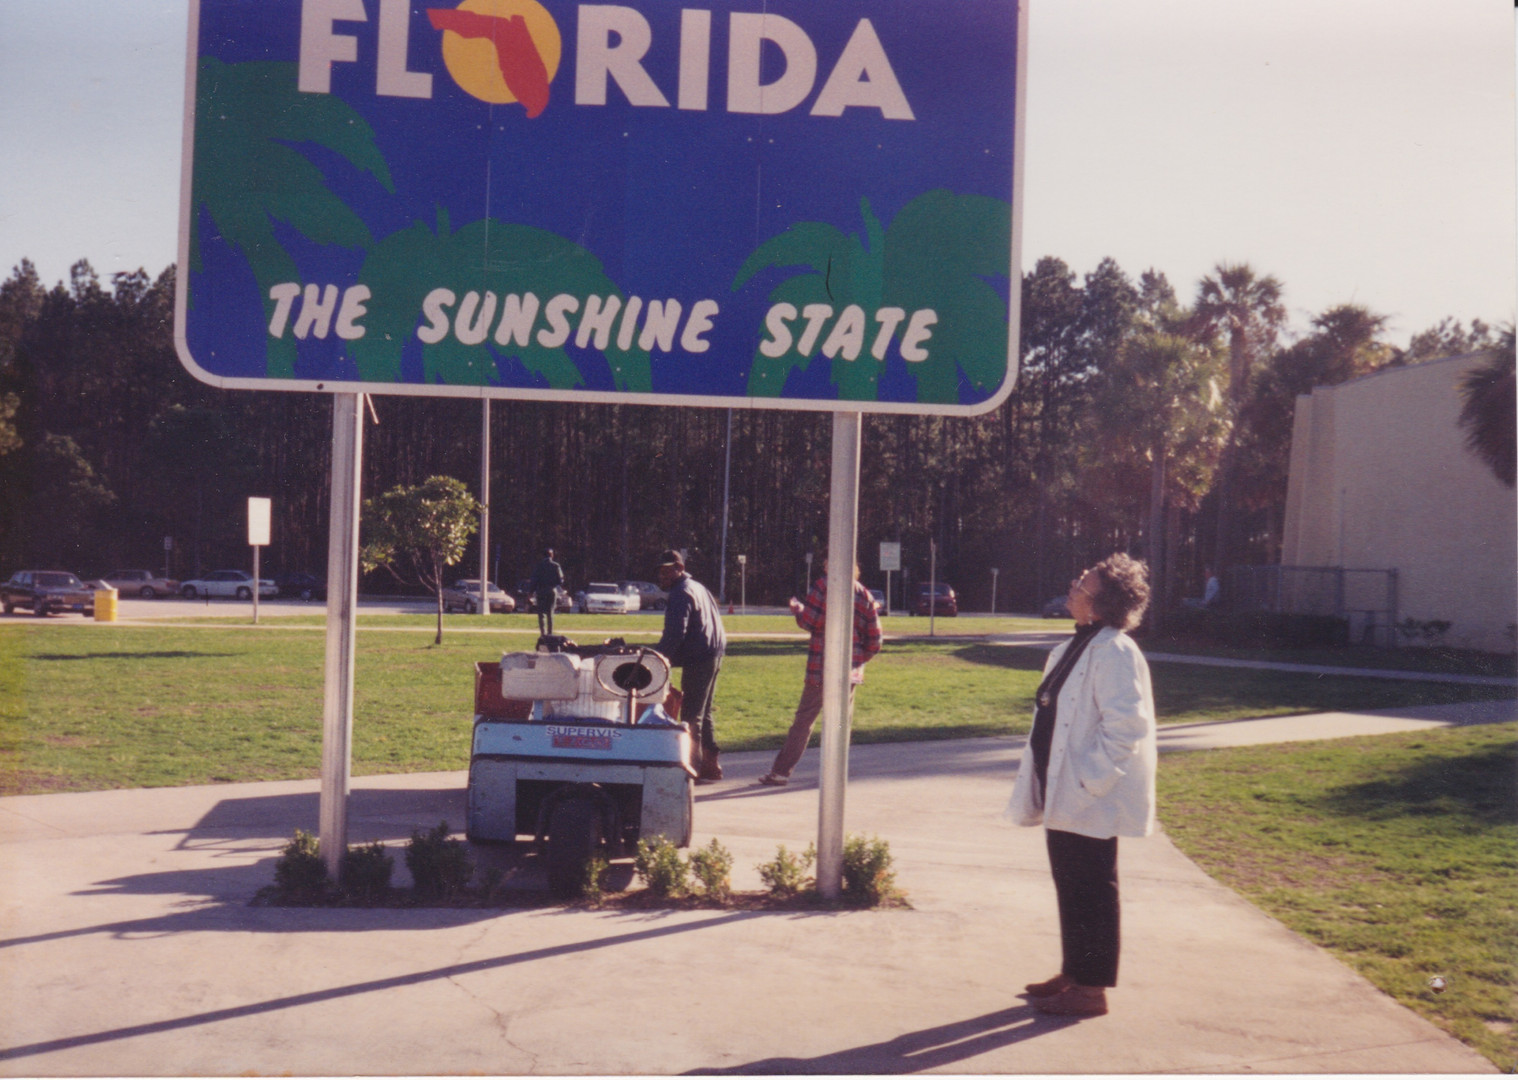 Florida 1.jpeg